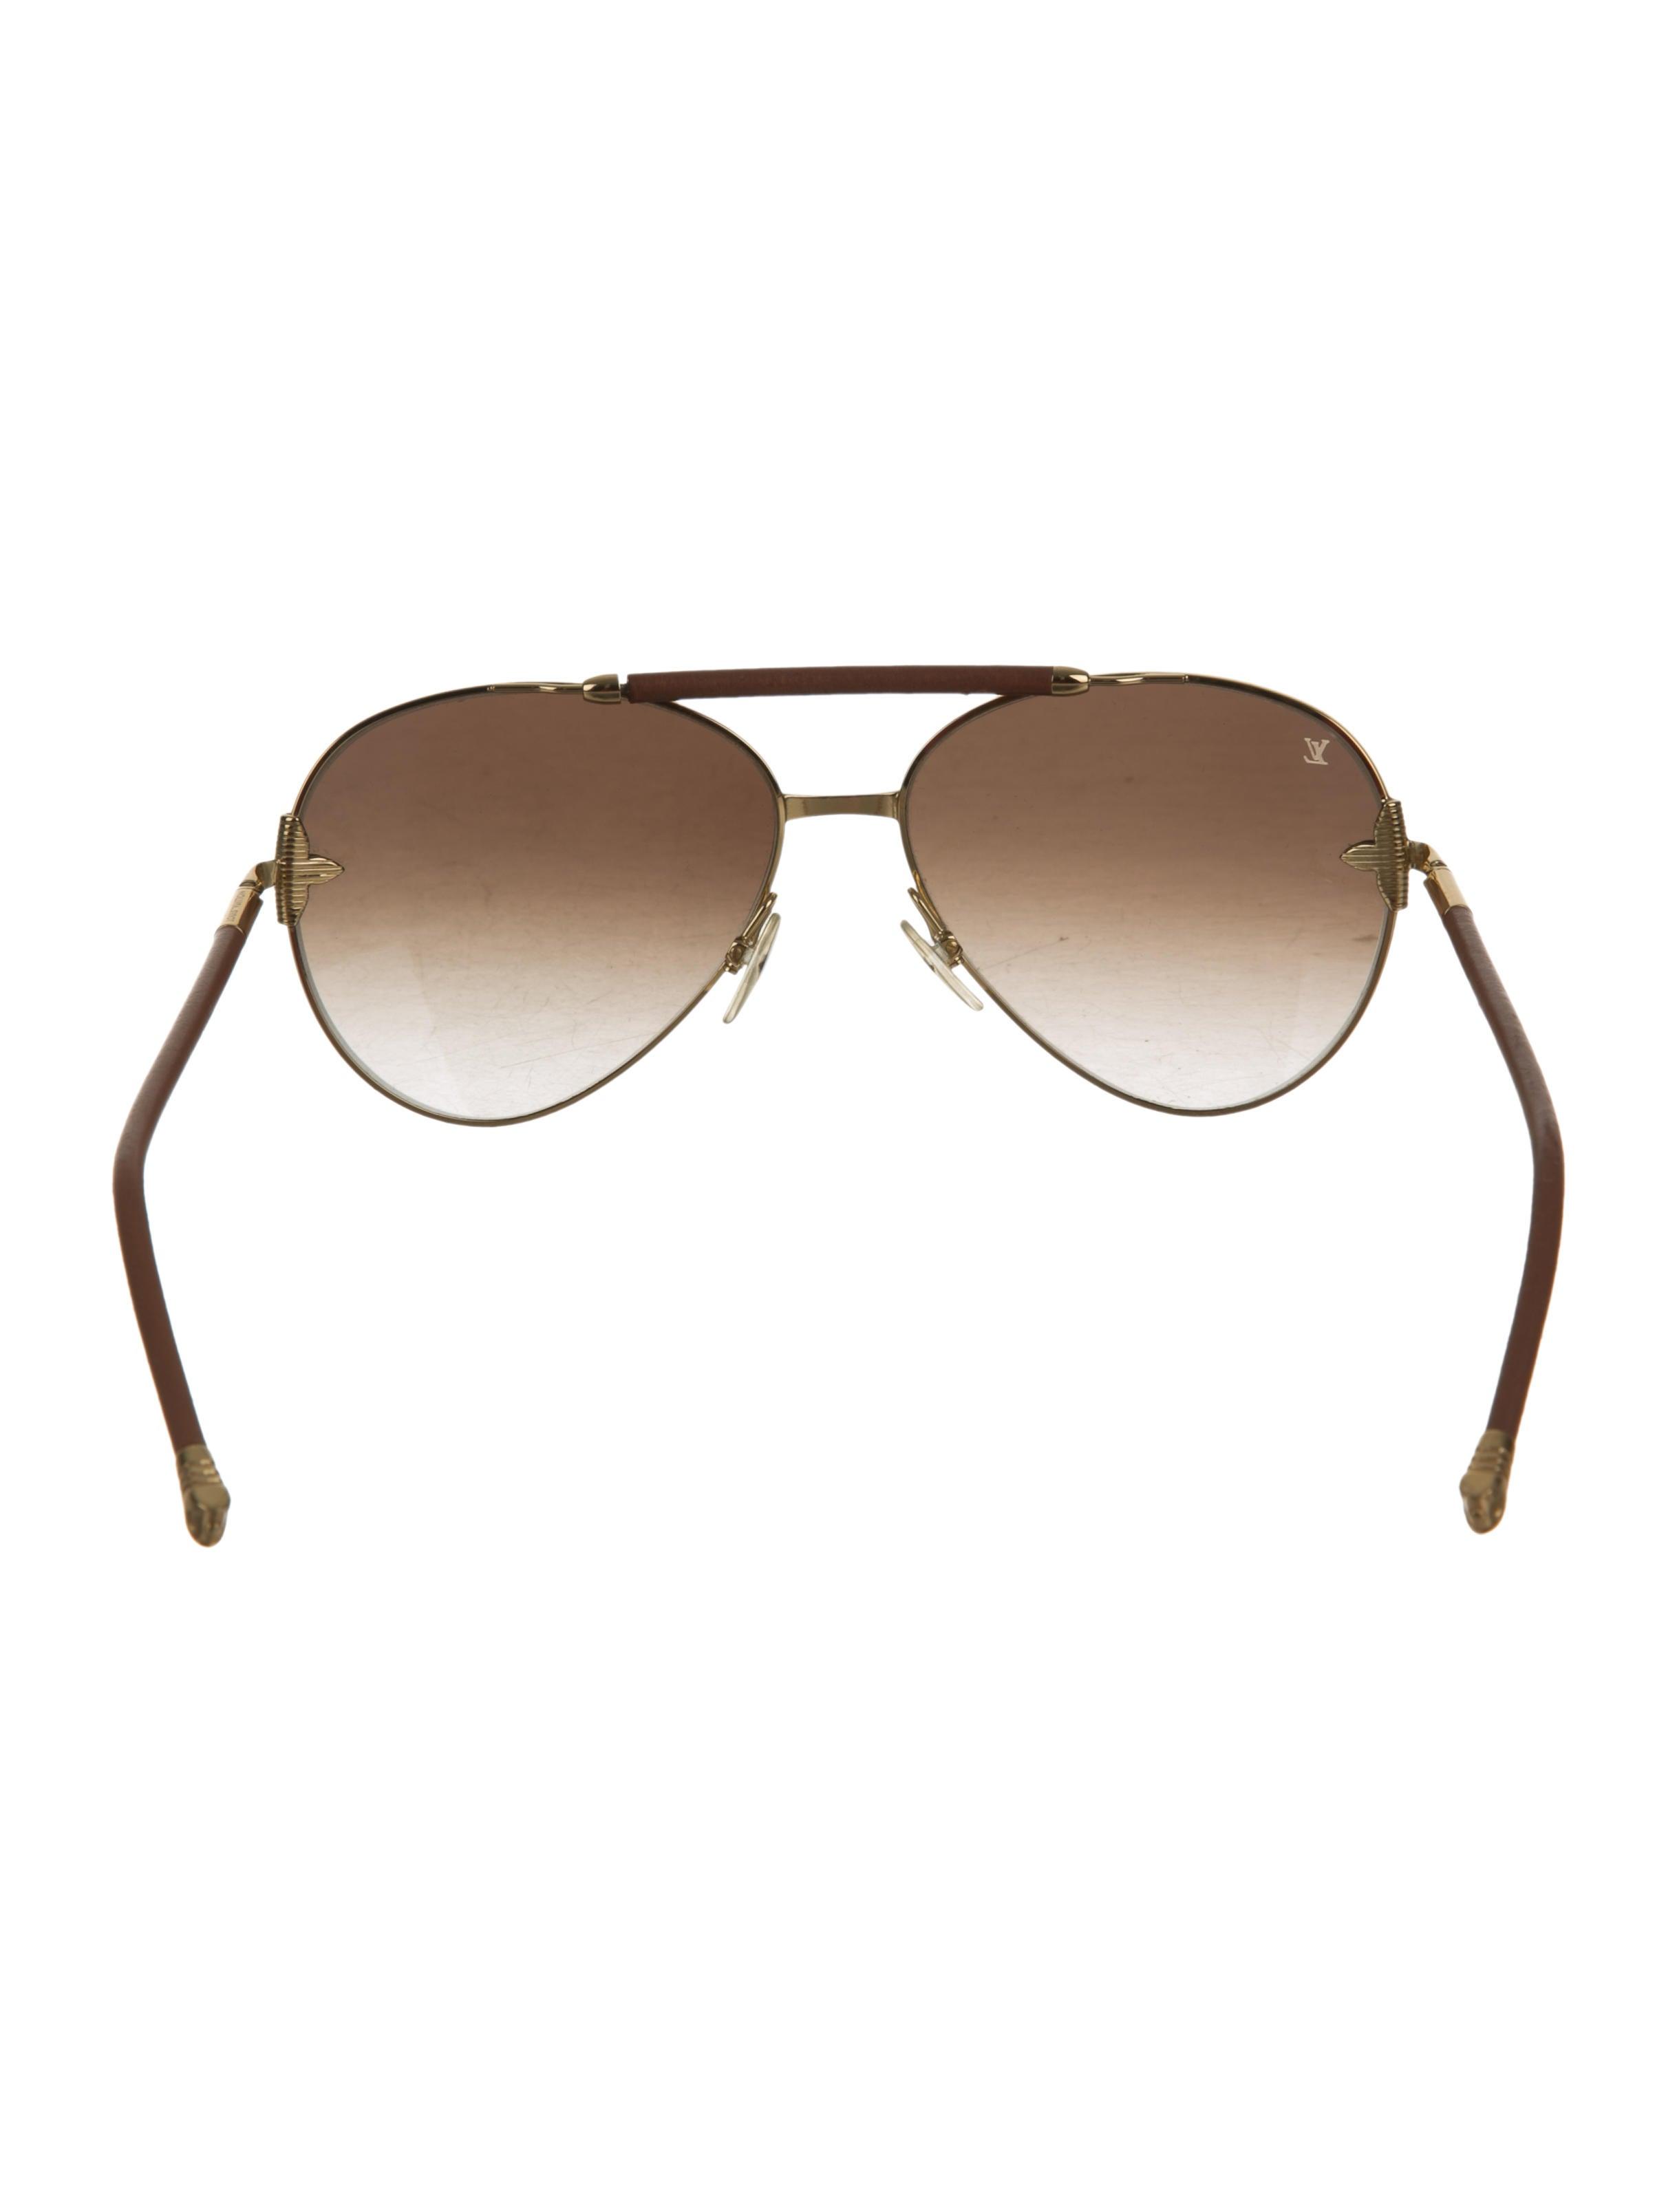 c85ae37ce718 Louis Vuitton Aviator Sunglasses Red